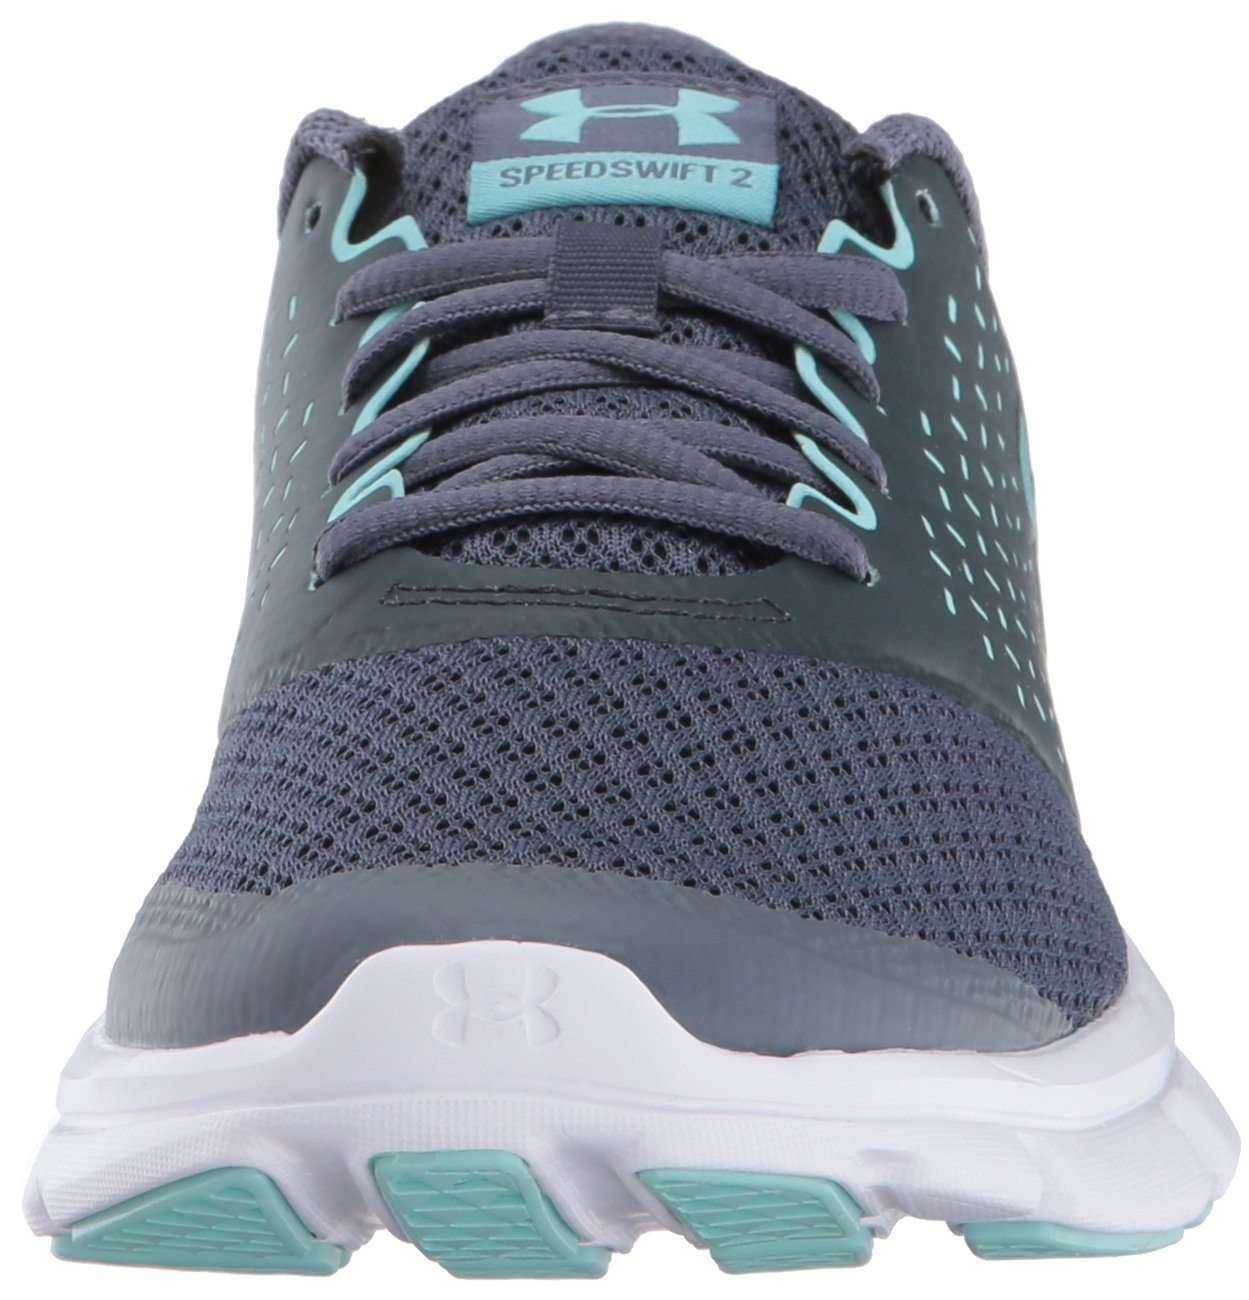 Under Armour Women's Speed Swift 2 Running Shoe B01N9FZH1X 6 M US Apollo Gray (101)/Stealth Gray